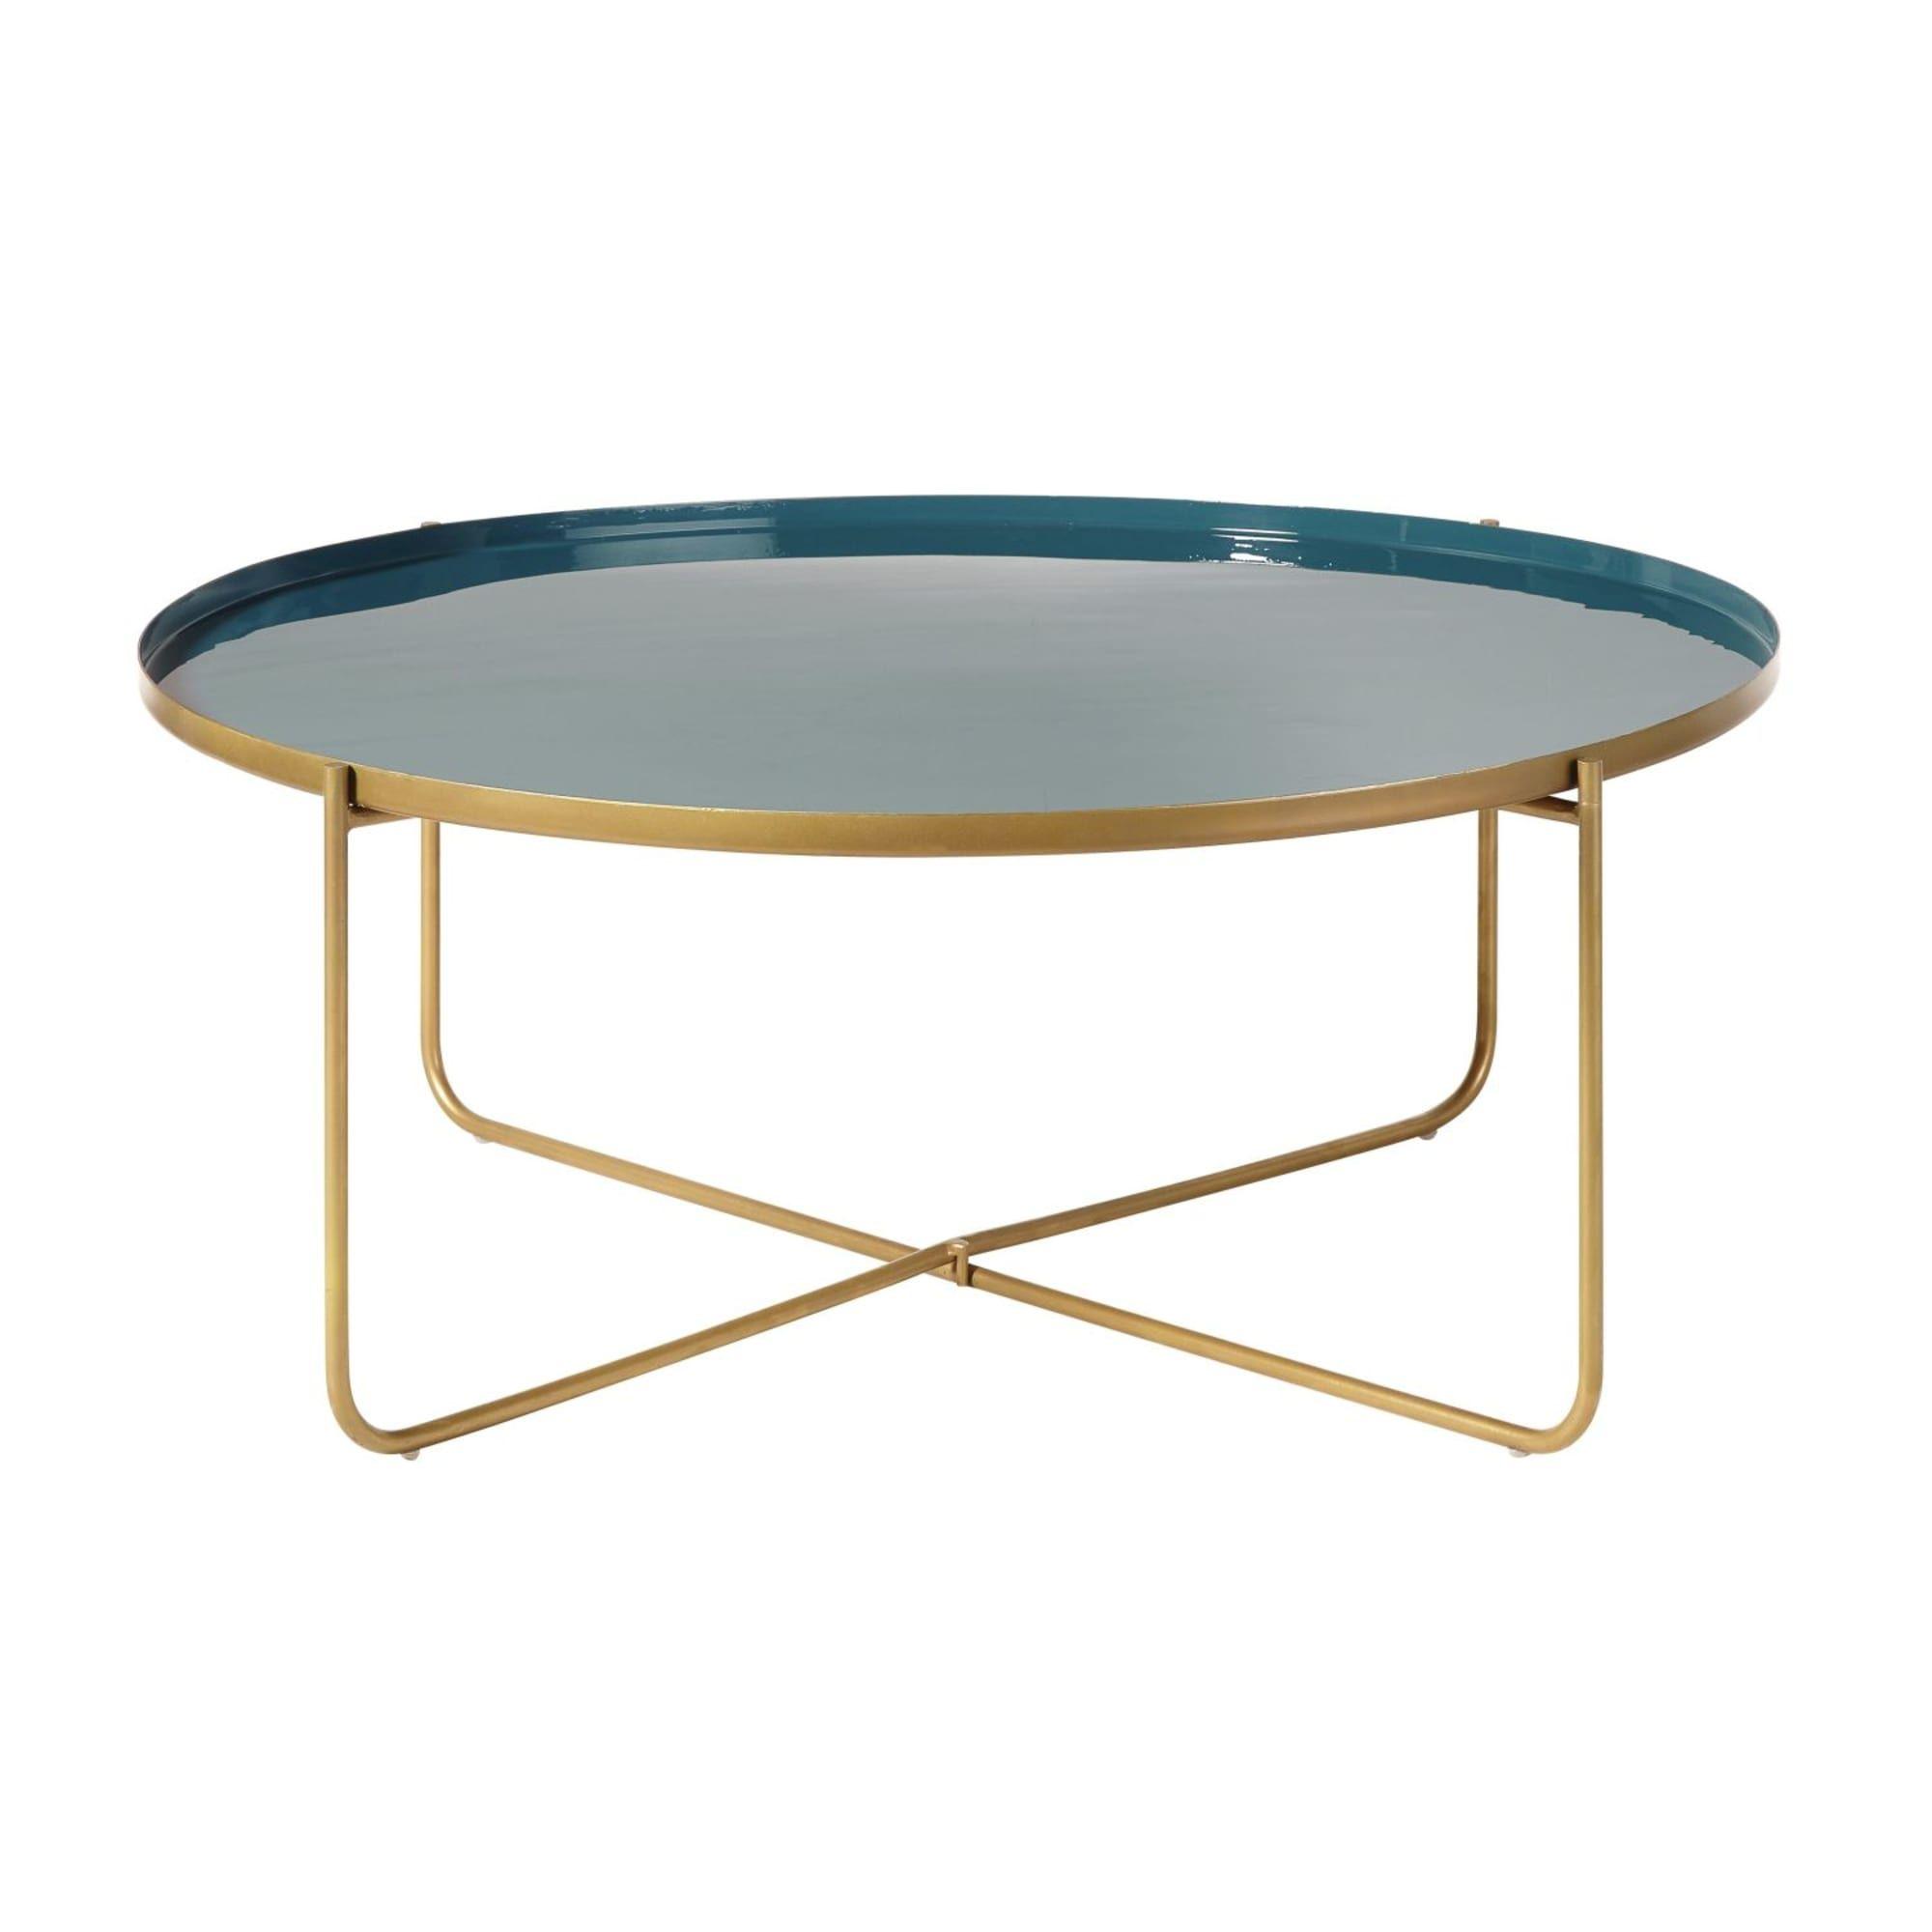 Table Basse Ronde En Metal Bleu Canard Et Dore Galet Table Basse Ronde Table Basse Table Basse Metal